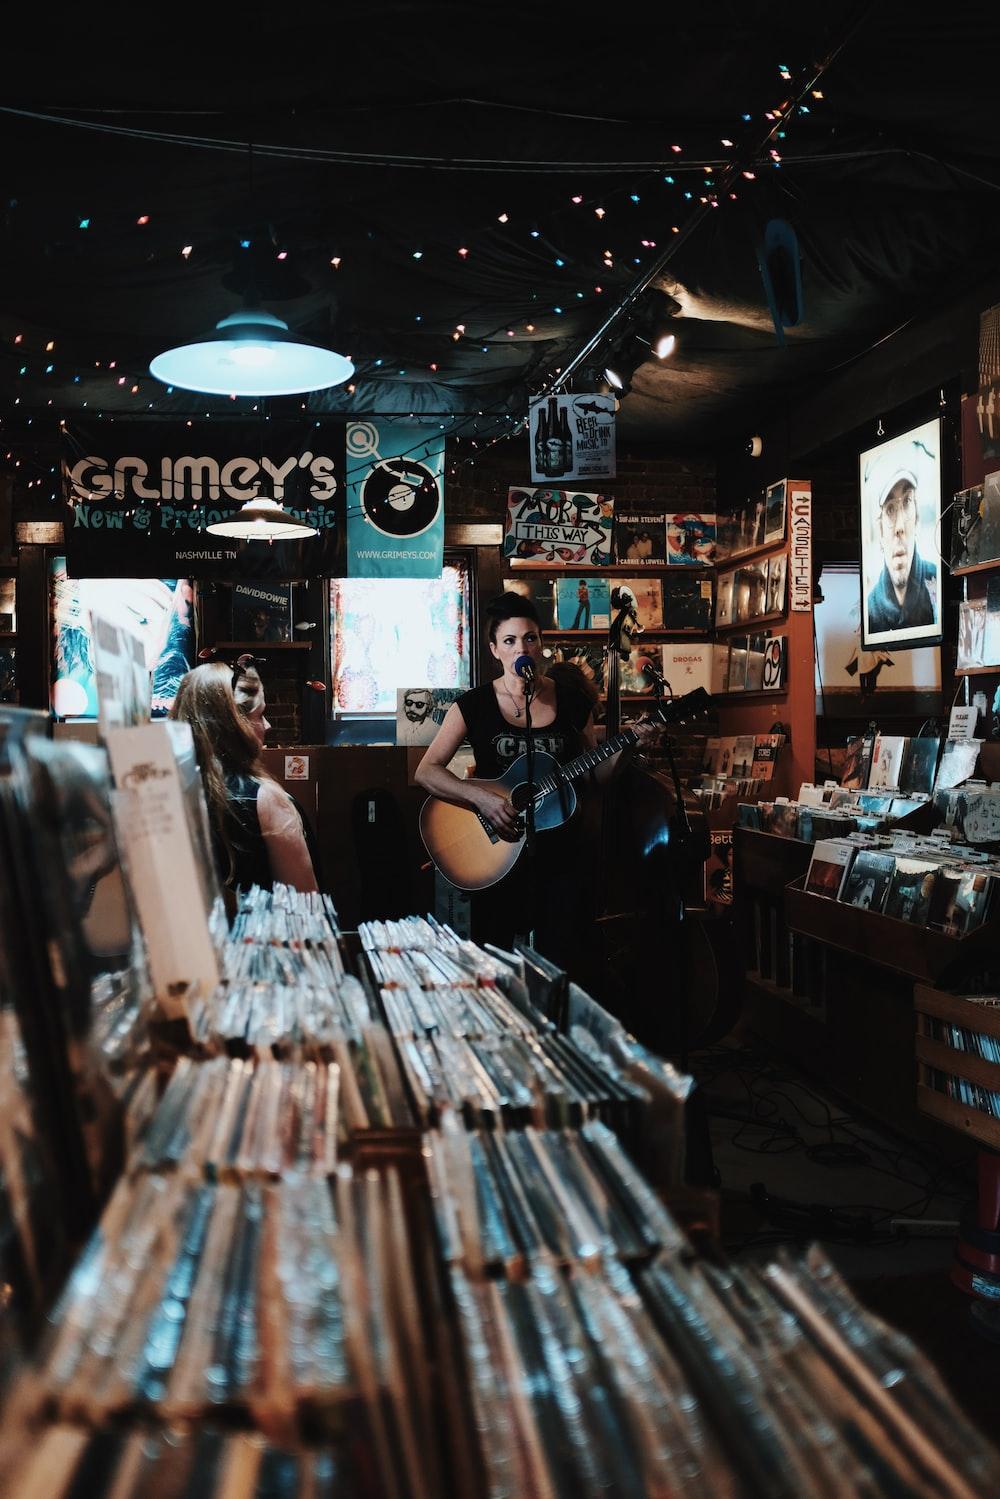 woman sings while playing guitar